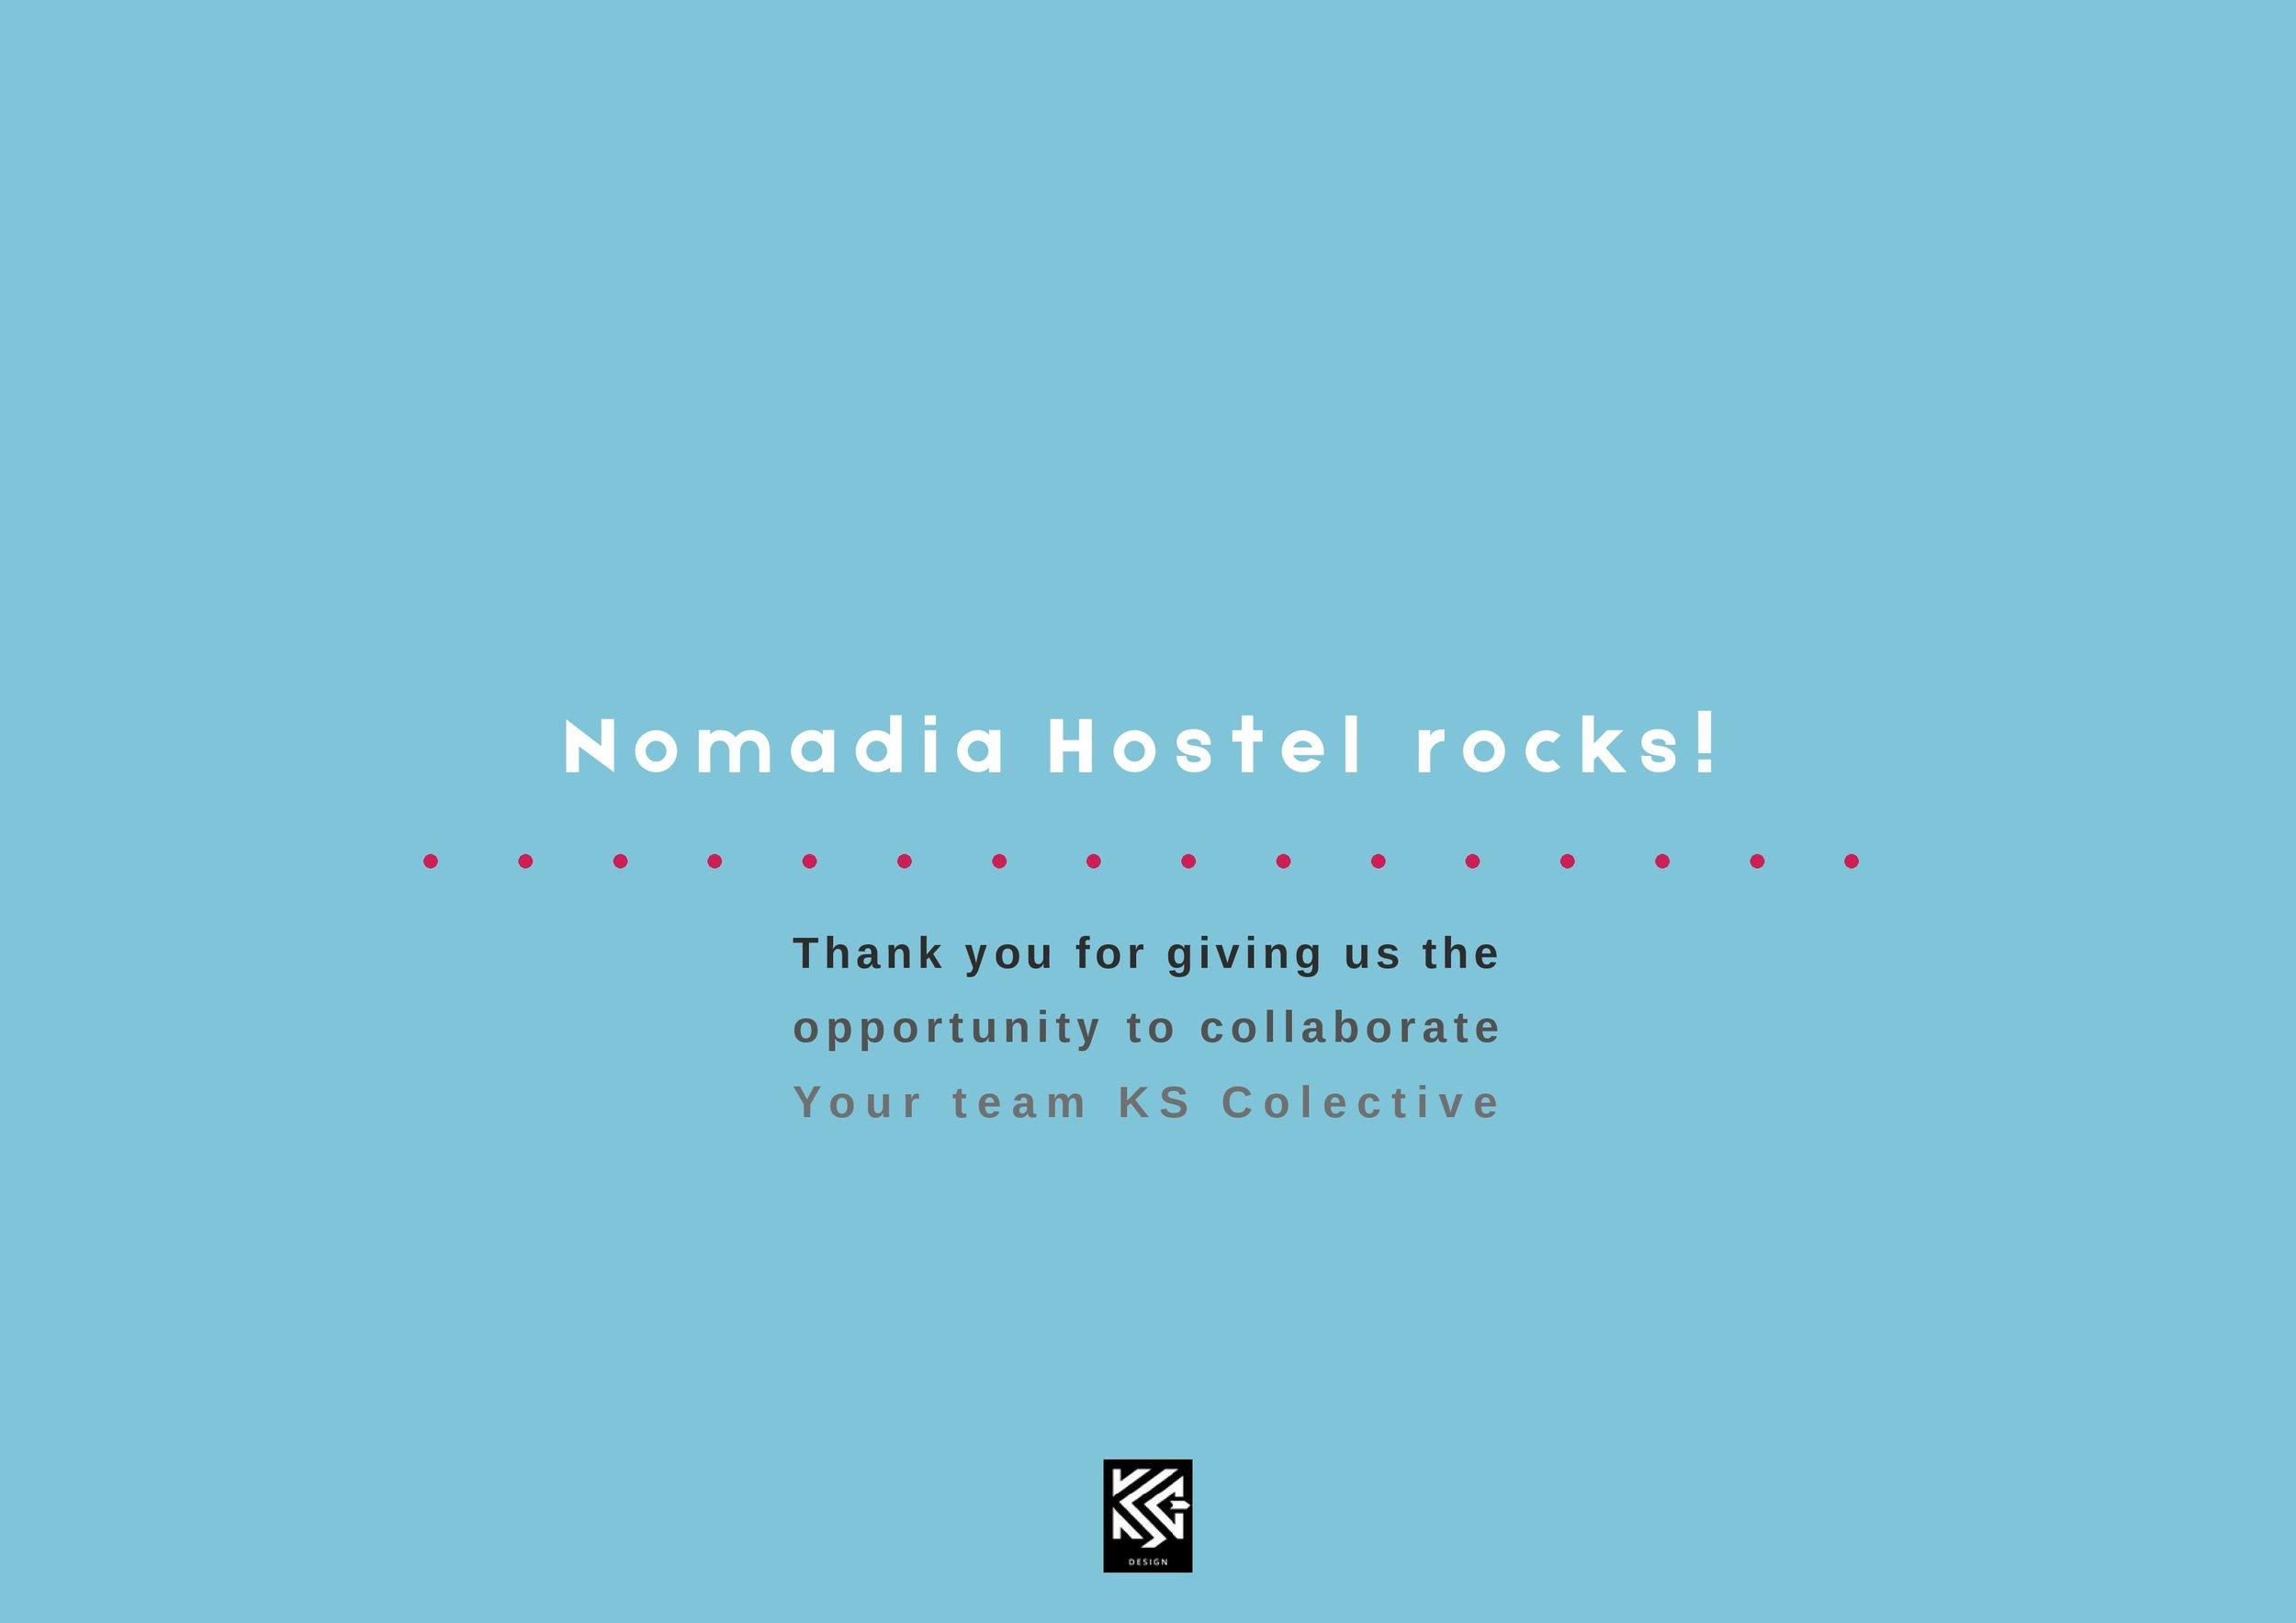 Brand Guideline_NomadiaHostel-page-019.jpg